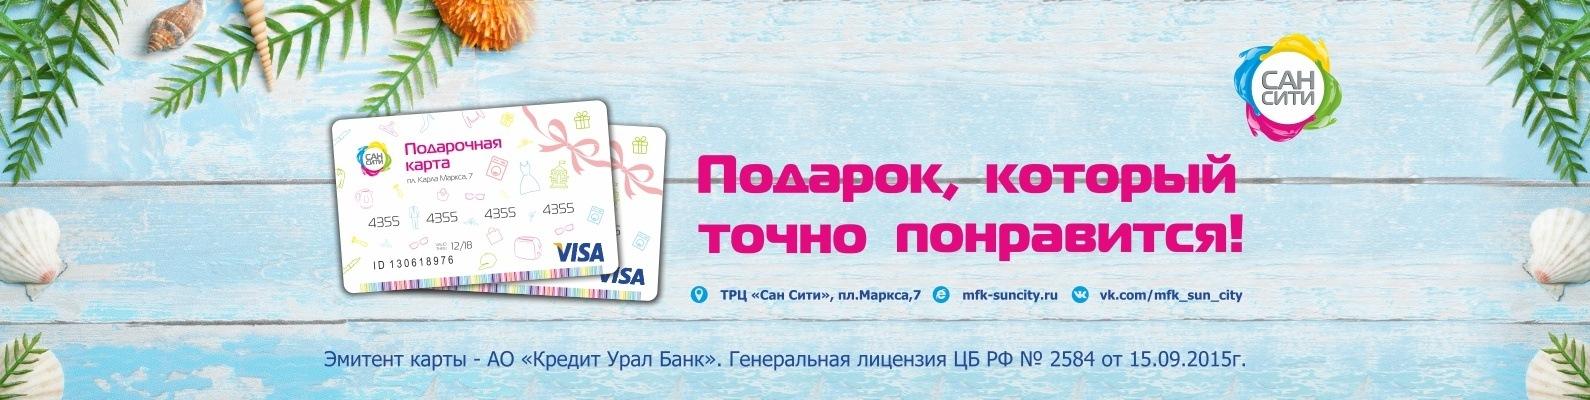 6617be70e МФК САН СИТИ | ВКонтакте